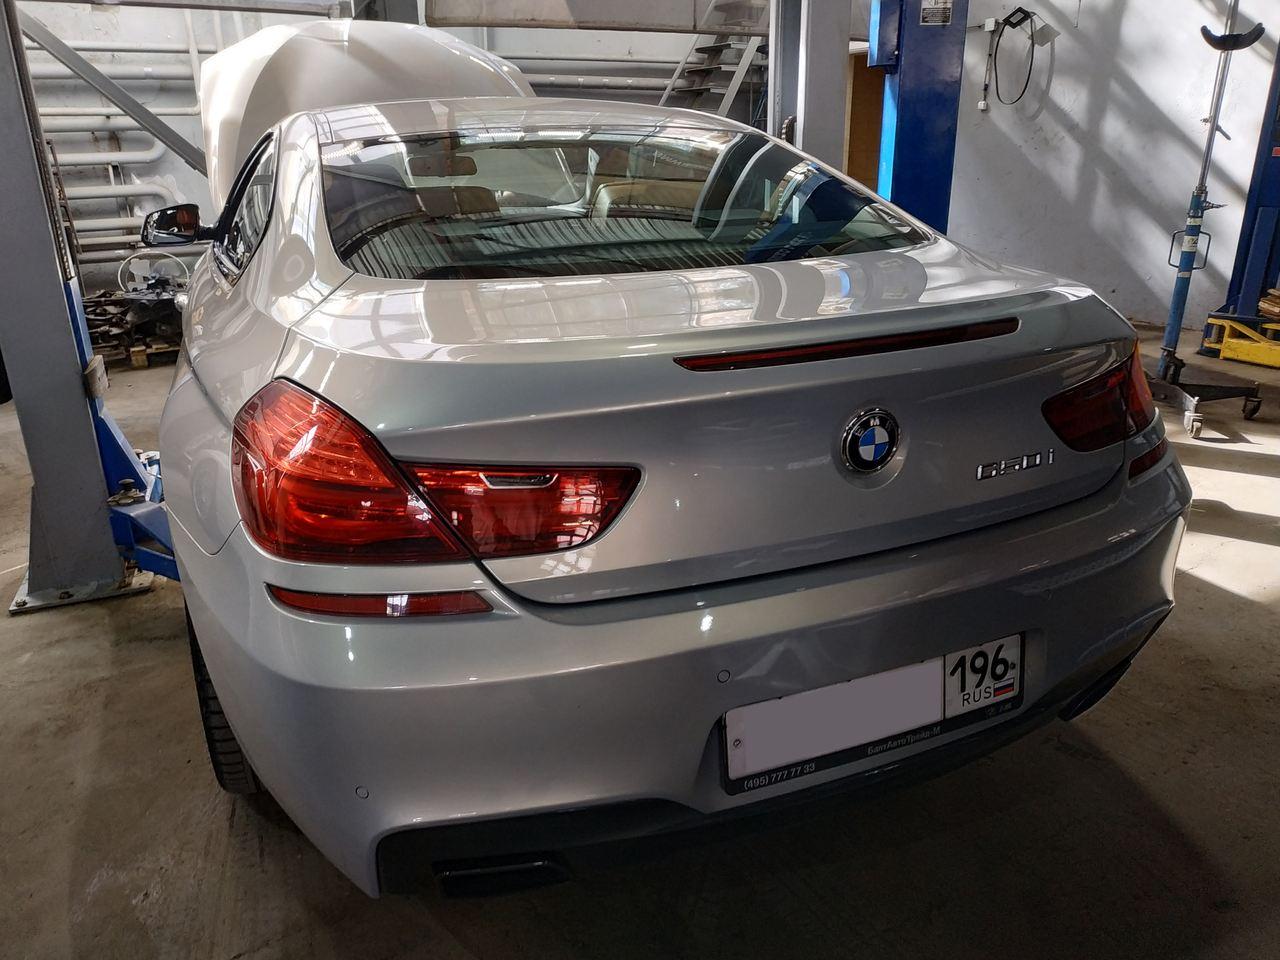 BMW F13 650i, вид сзади